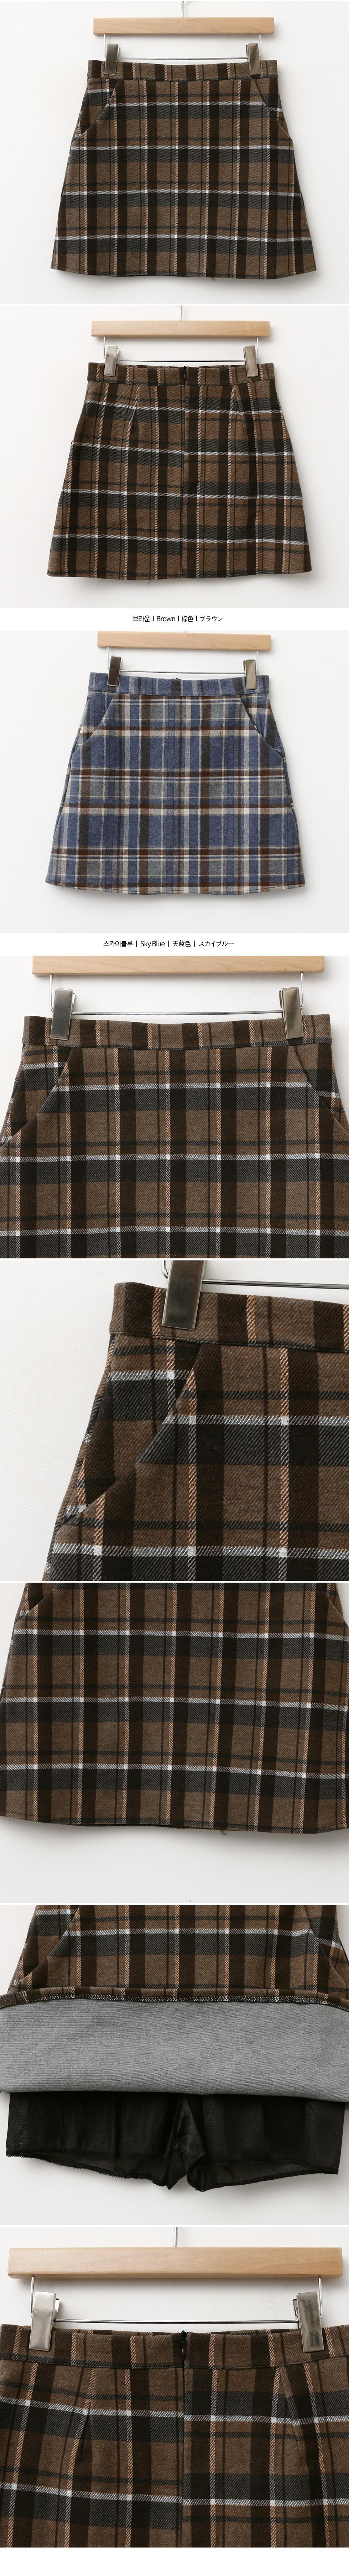 Have span check skirt